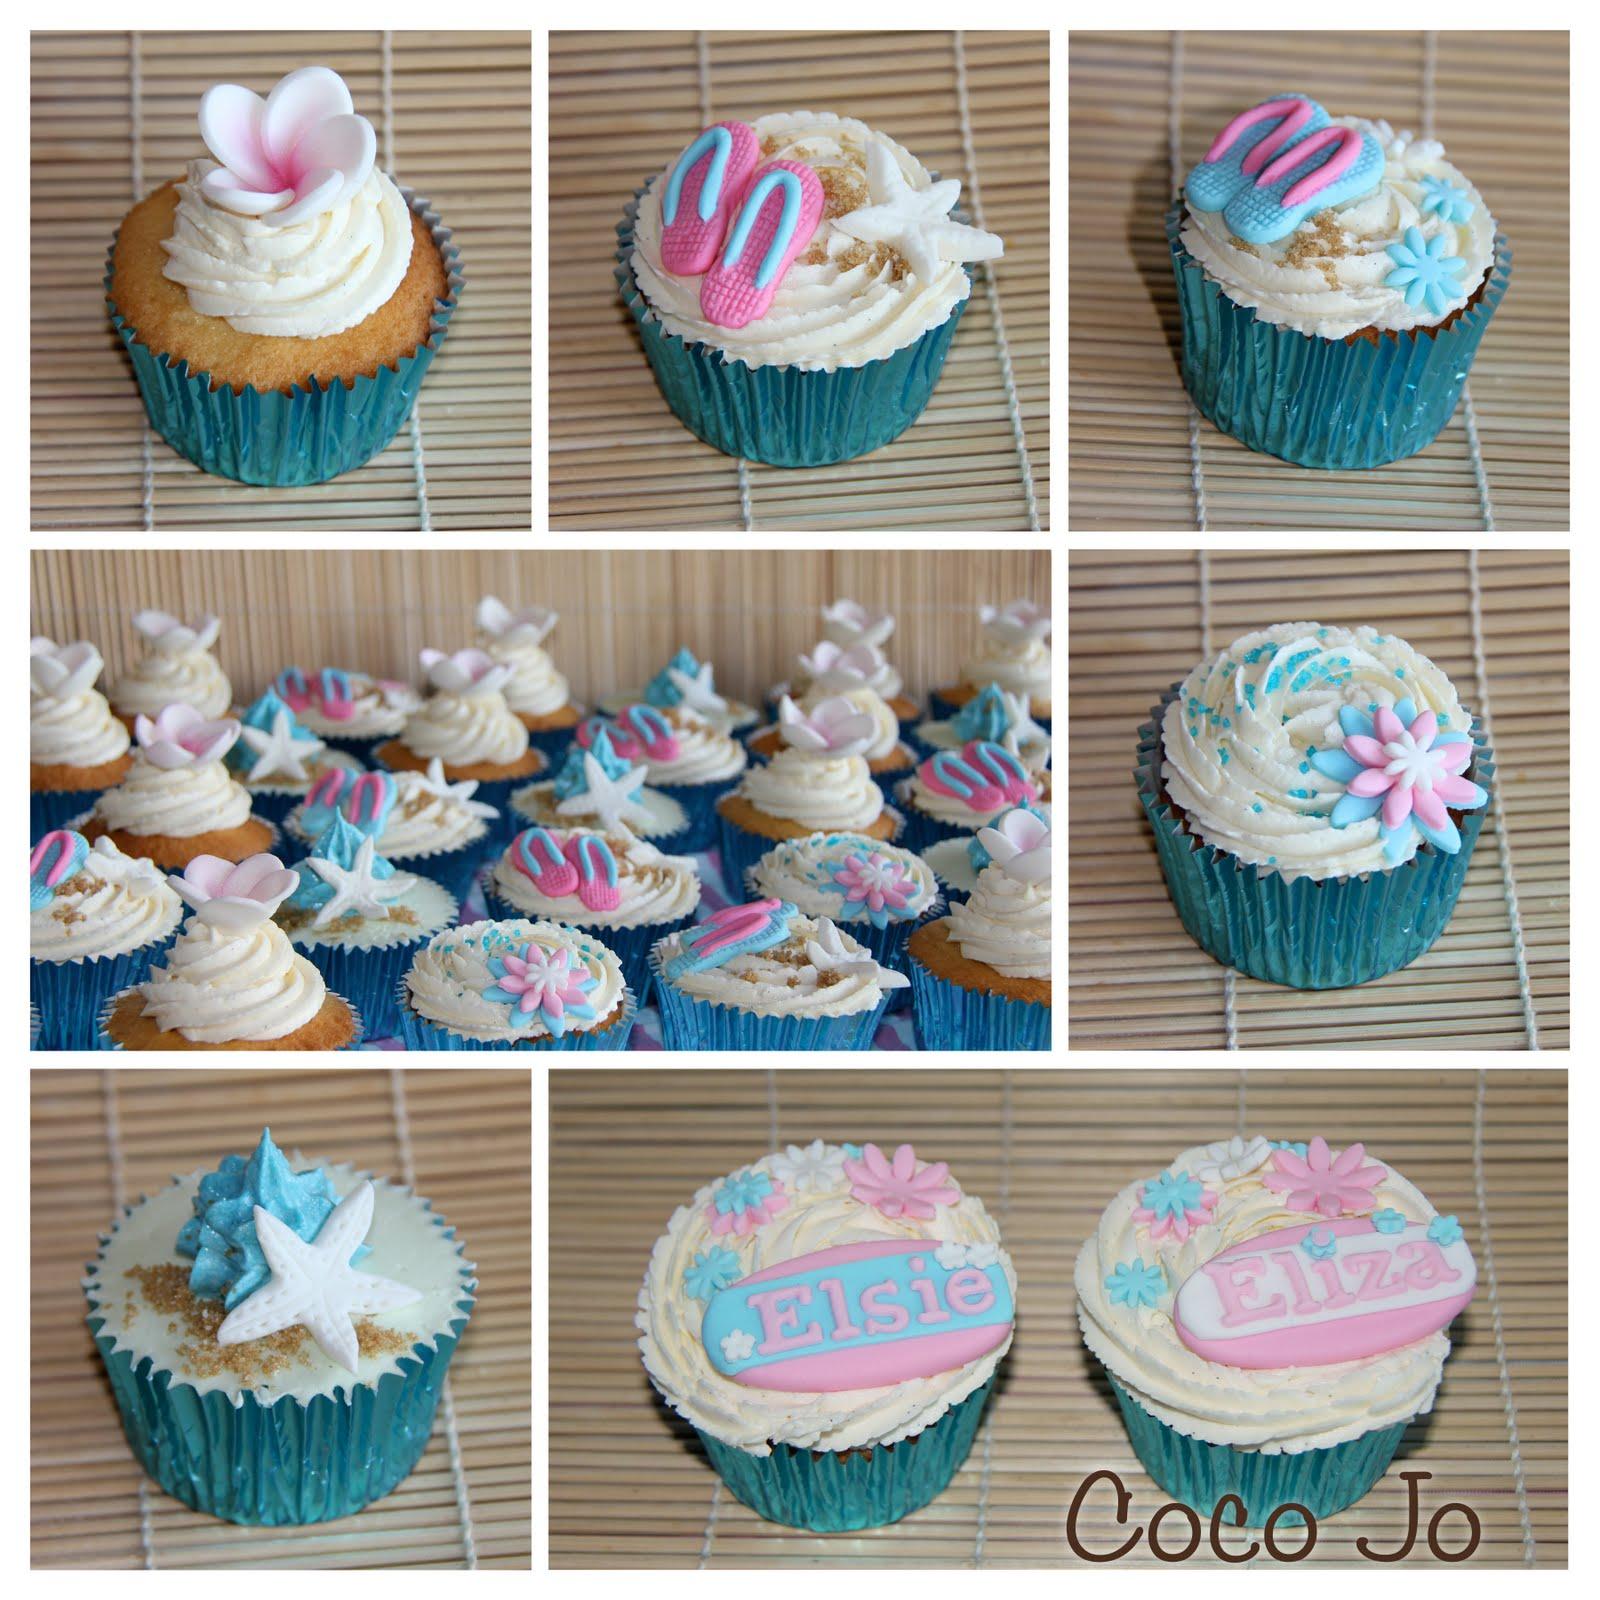 Coco Jo Cake Design Beach Theme Cupcakes